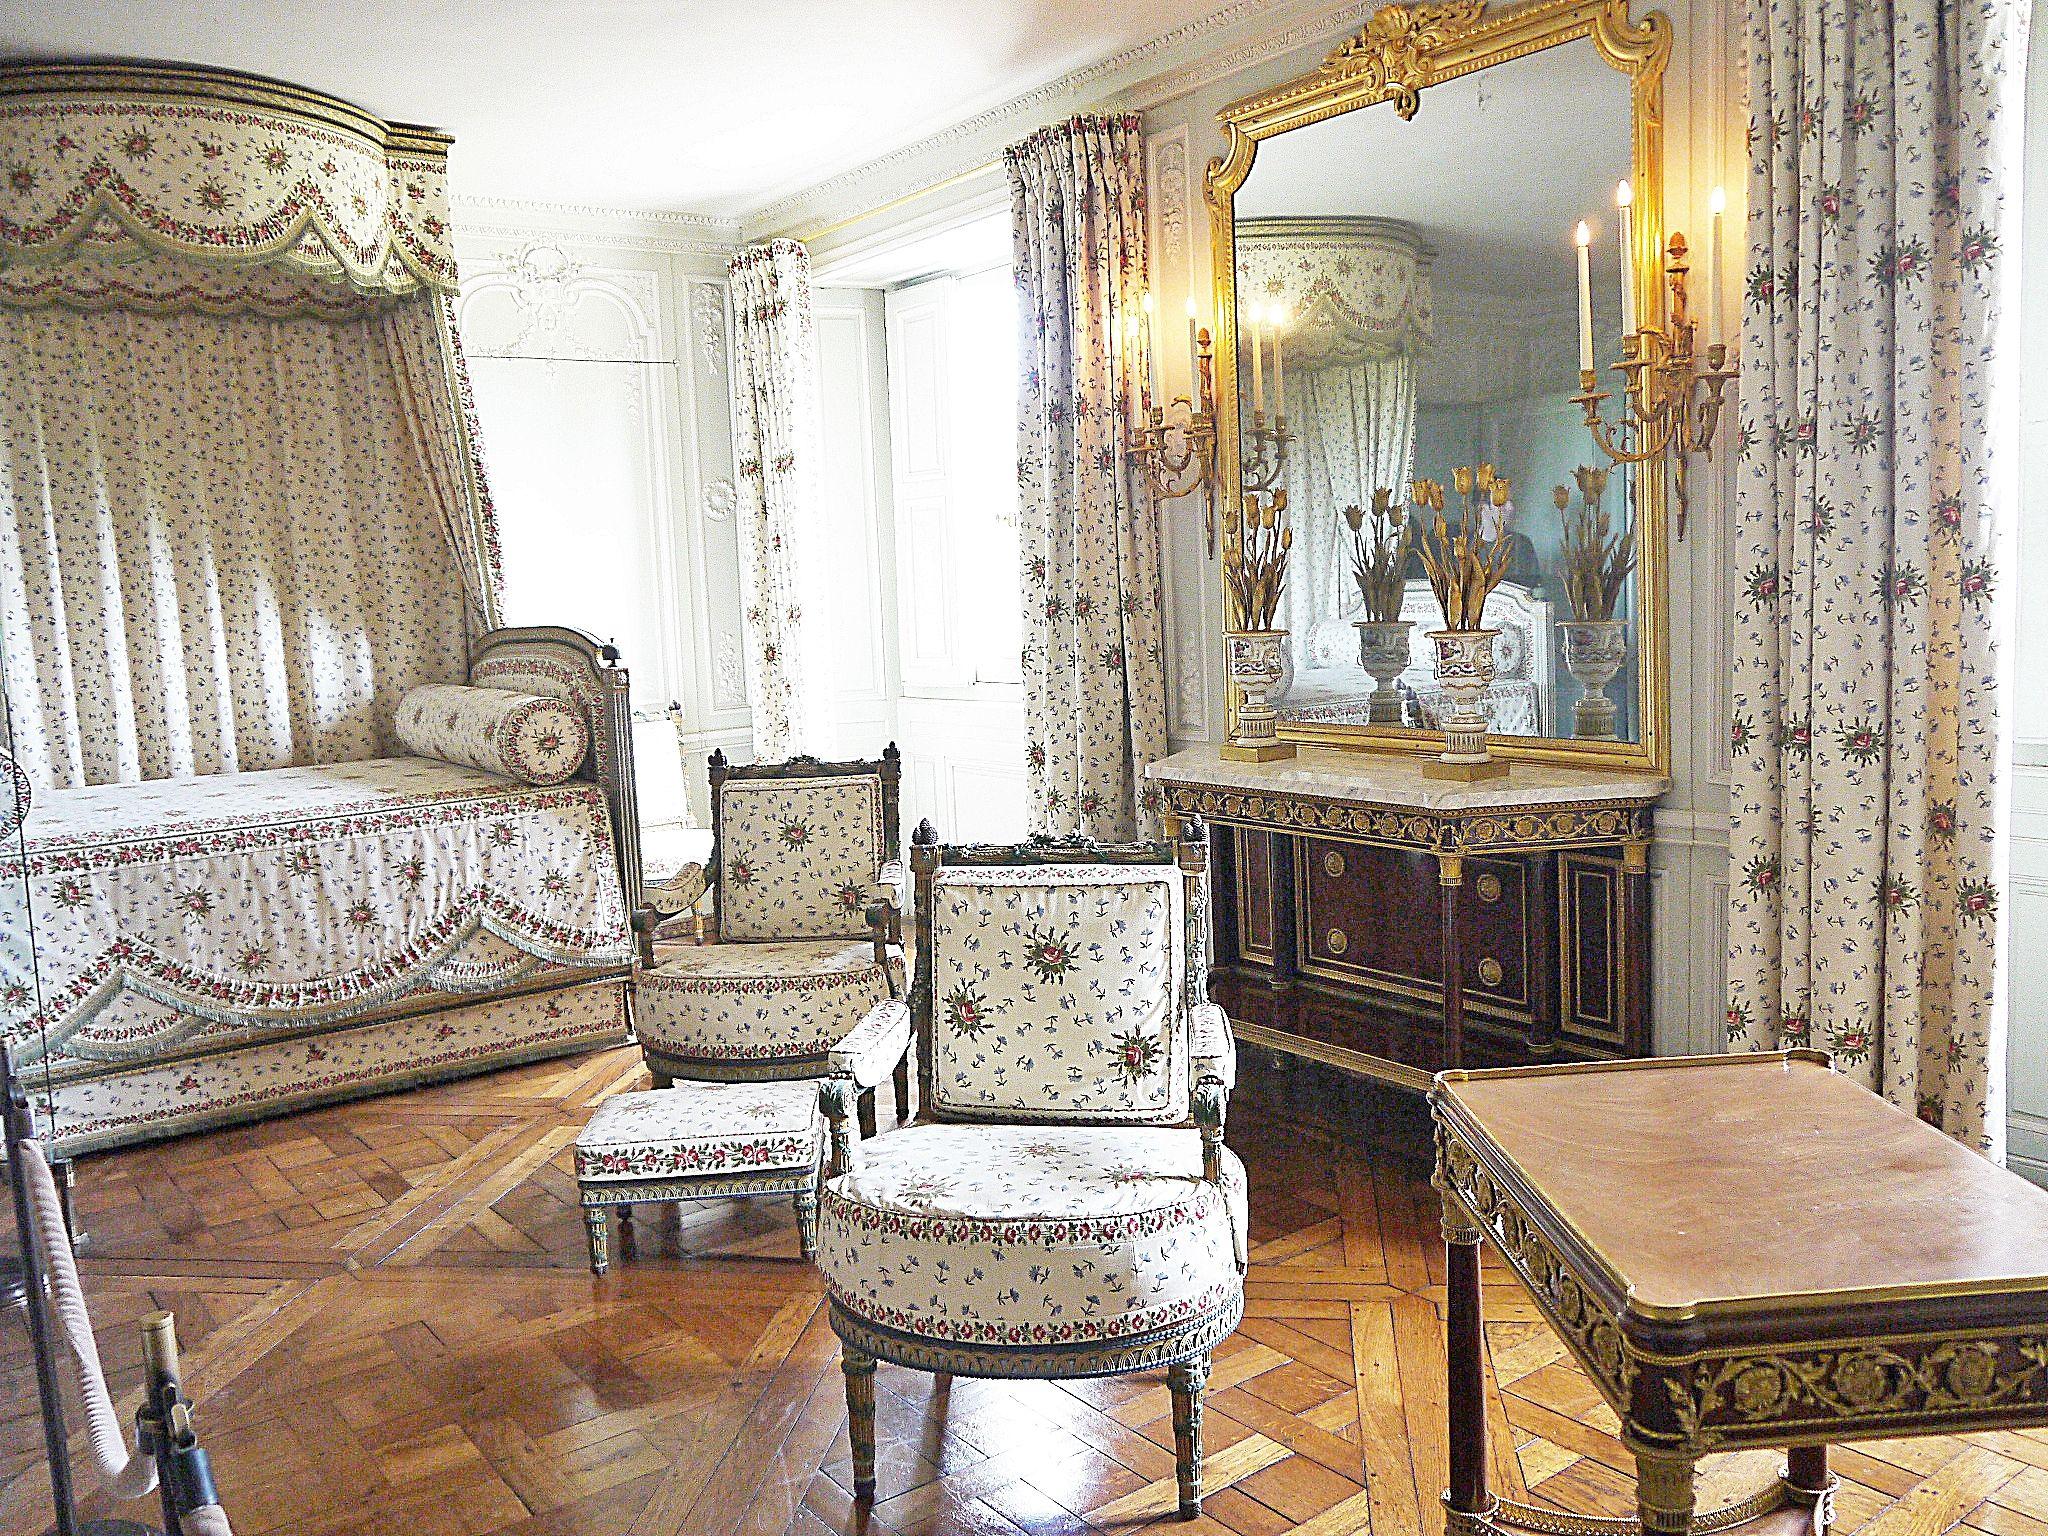 Versailles - Le Petit Trianon : la Chambre de la Reine | Chambre de la reine,  Petit trianon, Trianon